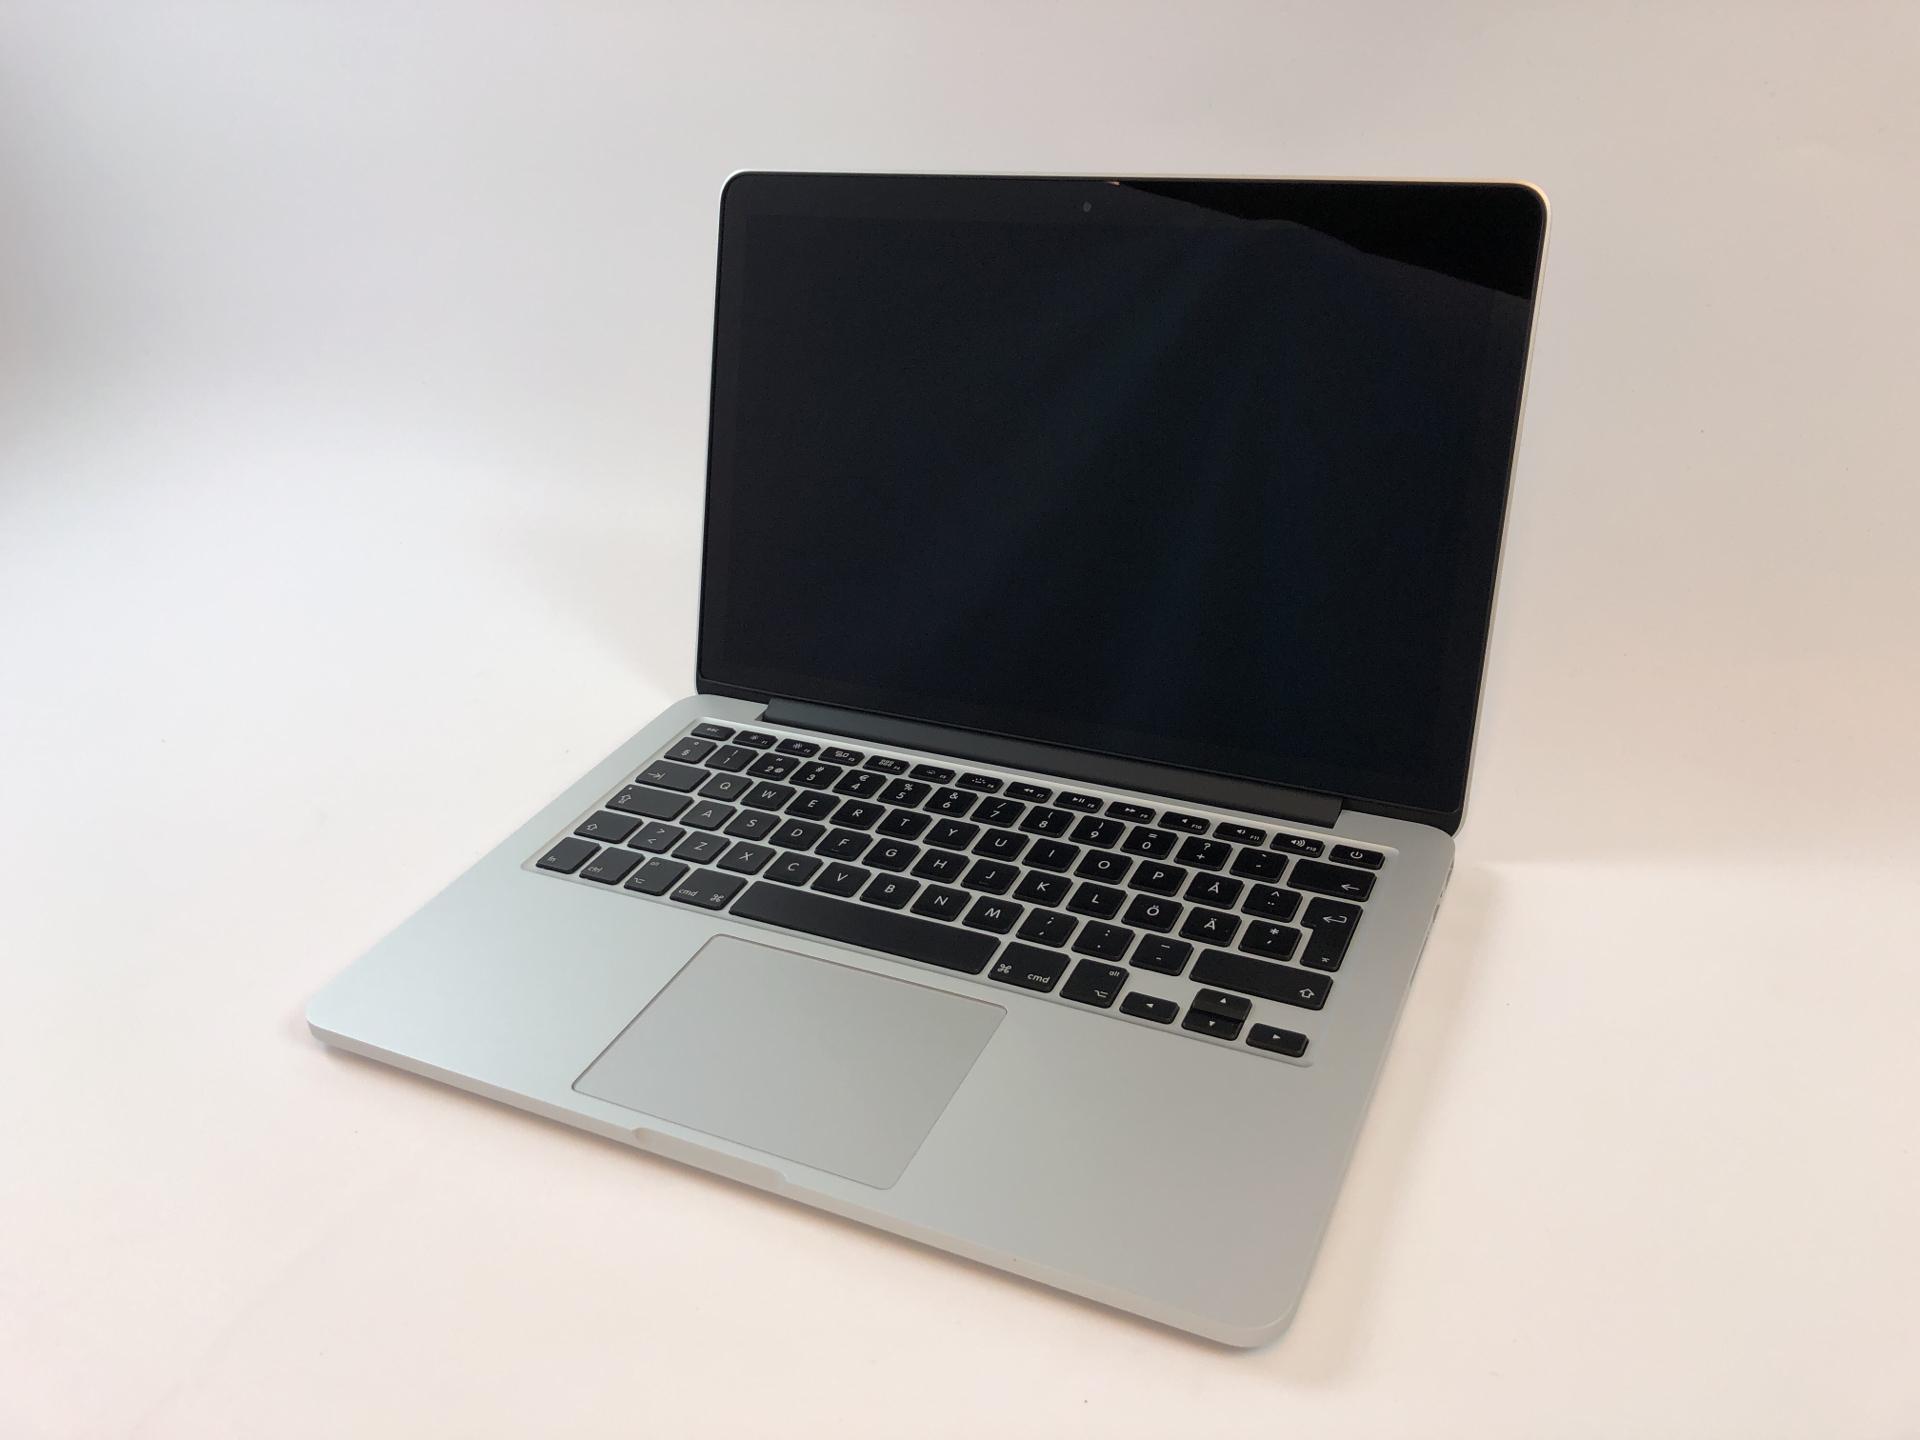 "MacBook Pro Retina 13"" Early 2015 (Intel Core i5 2.7 GHz 8 GB RAM 128 GB SSD), Intel Core i5 2.7 GHz, 8 GB RAM, 128 GB SSD, bild 1"